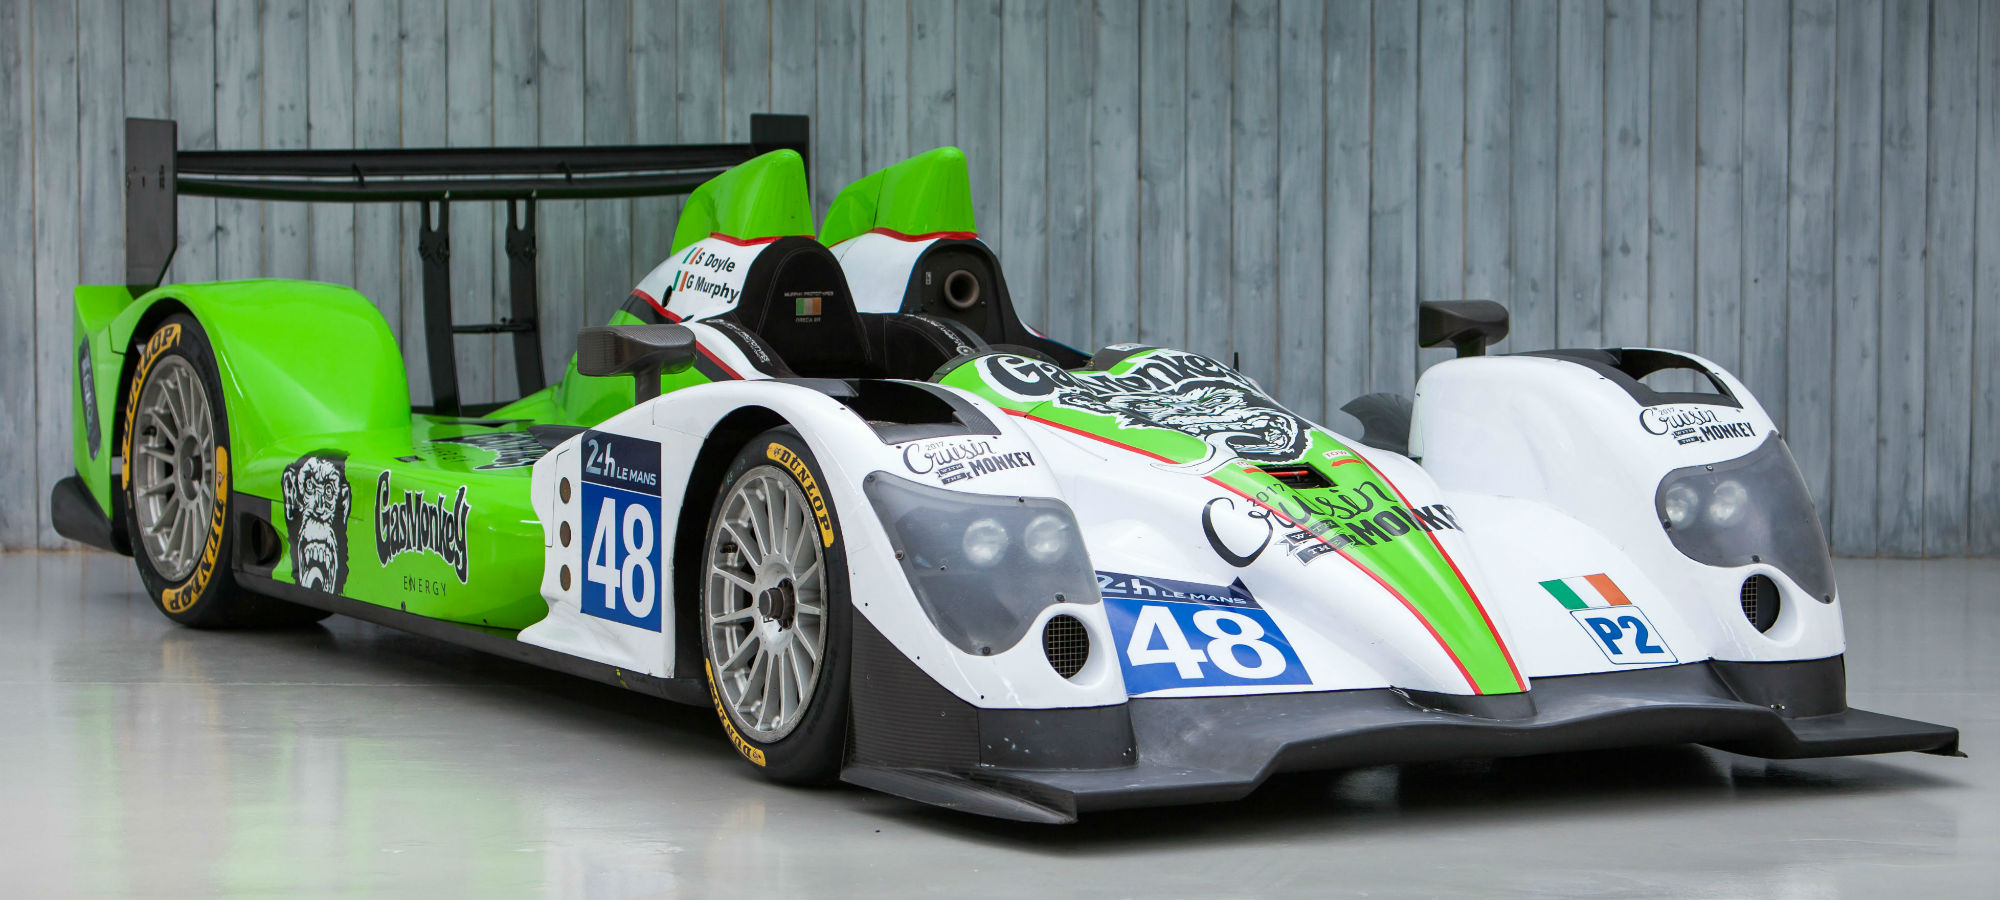 The Ex - AF Corse, Murphy Prototypes, Le Mans Veteran 2013 Oreca 03R LMP2